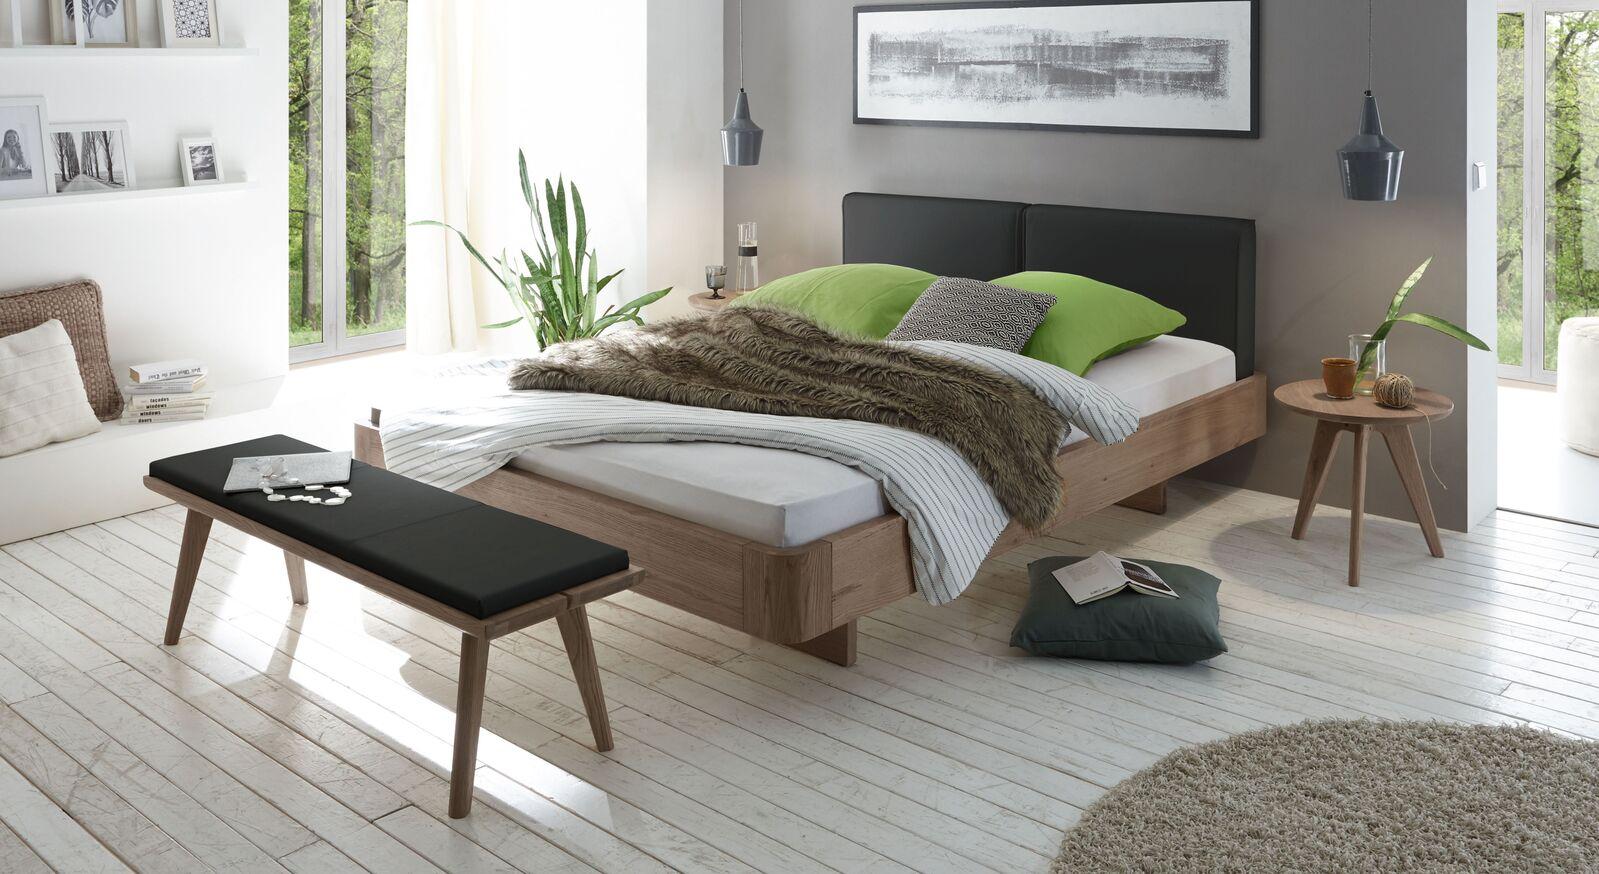 Passende Beimöbel zum Bett Inesis